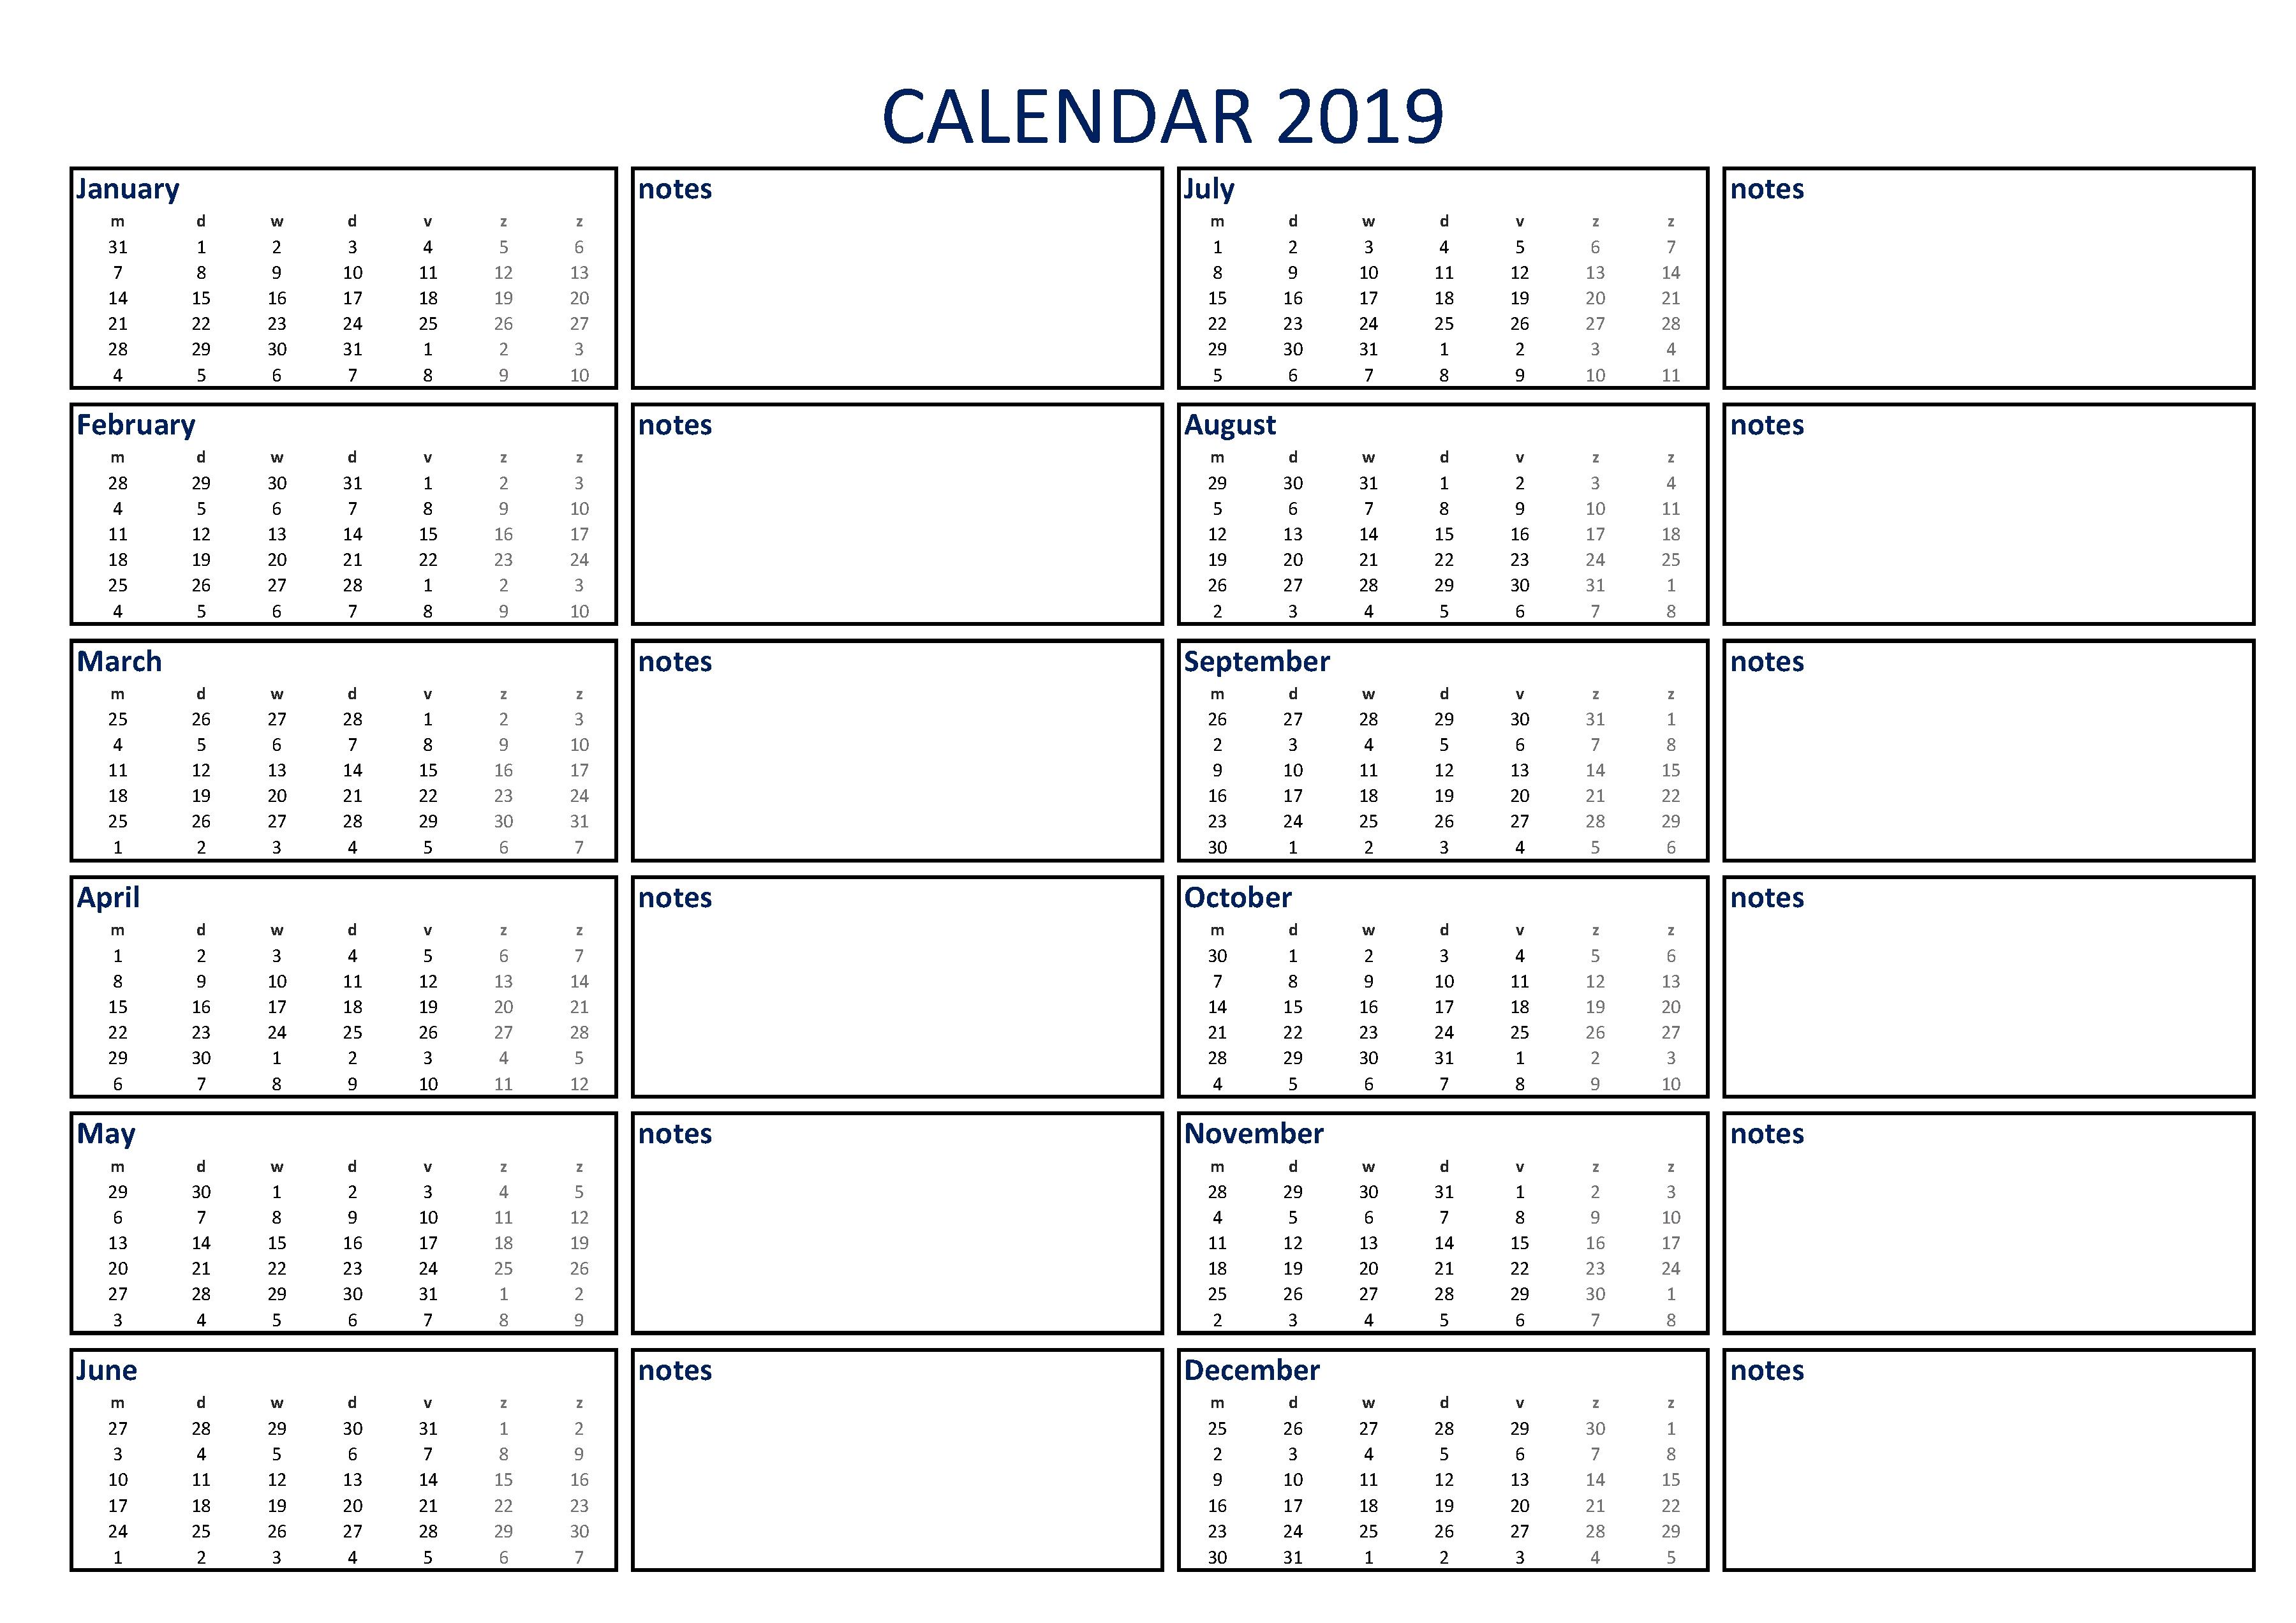 Free Calendar 2019 With Notes A4 | Templates At Calendar 2019 Notes